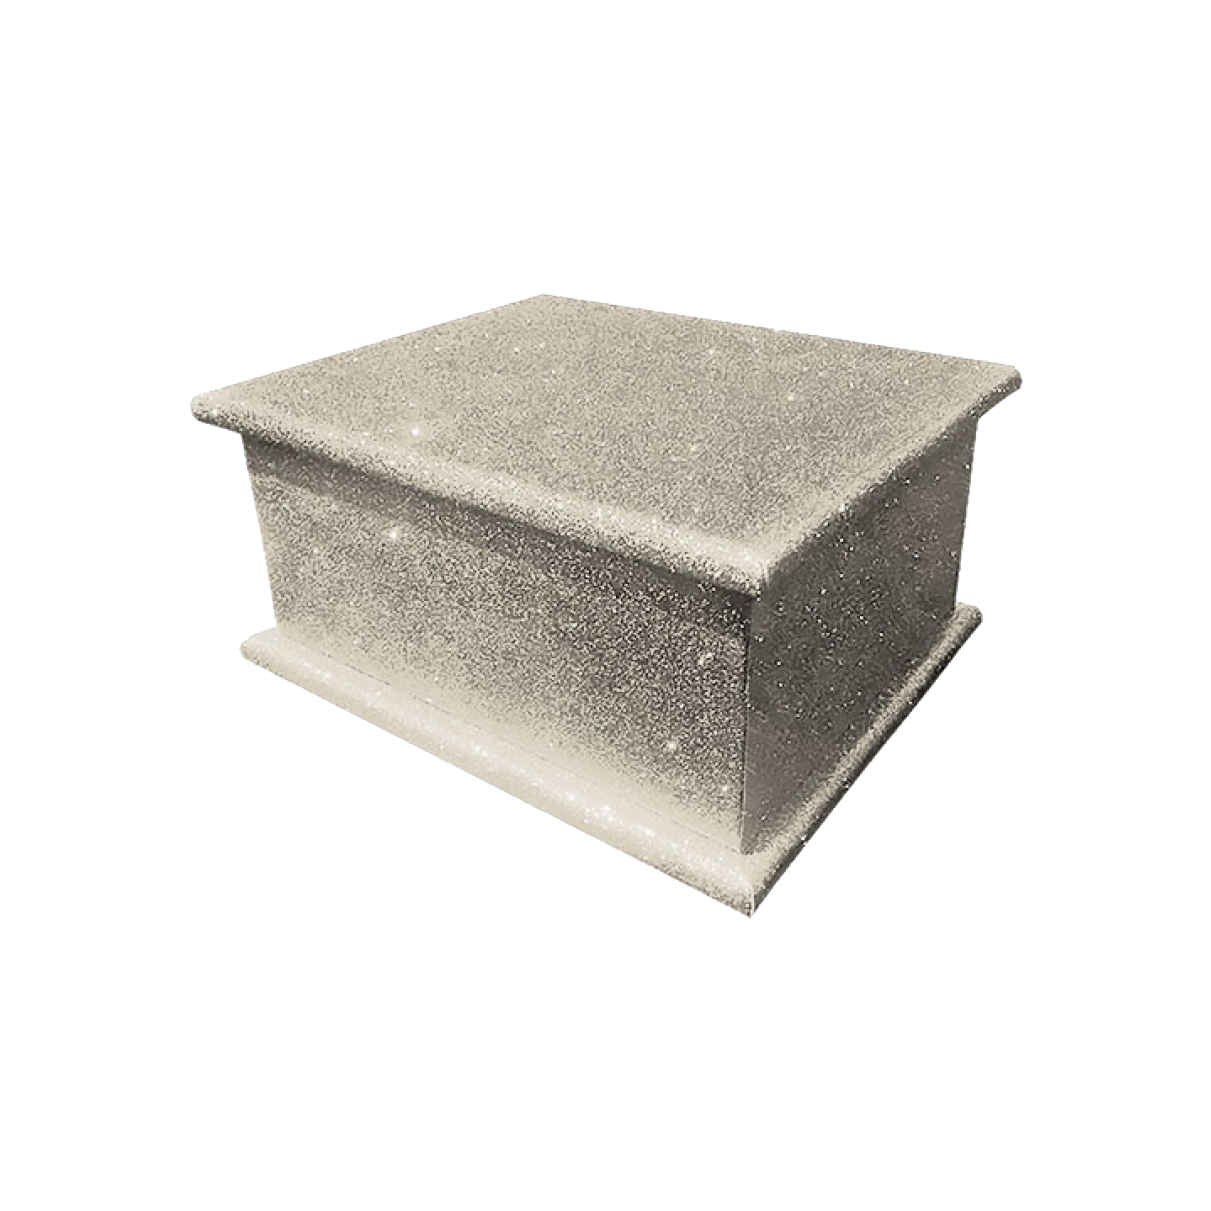 Glitter Adult Ashes Casket – Platinum